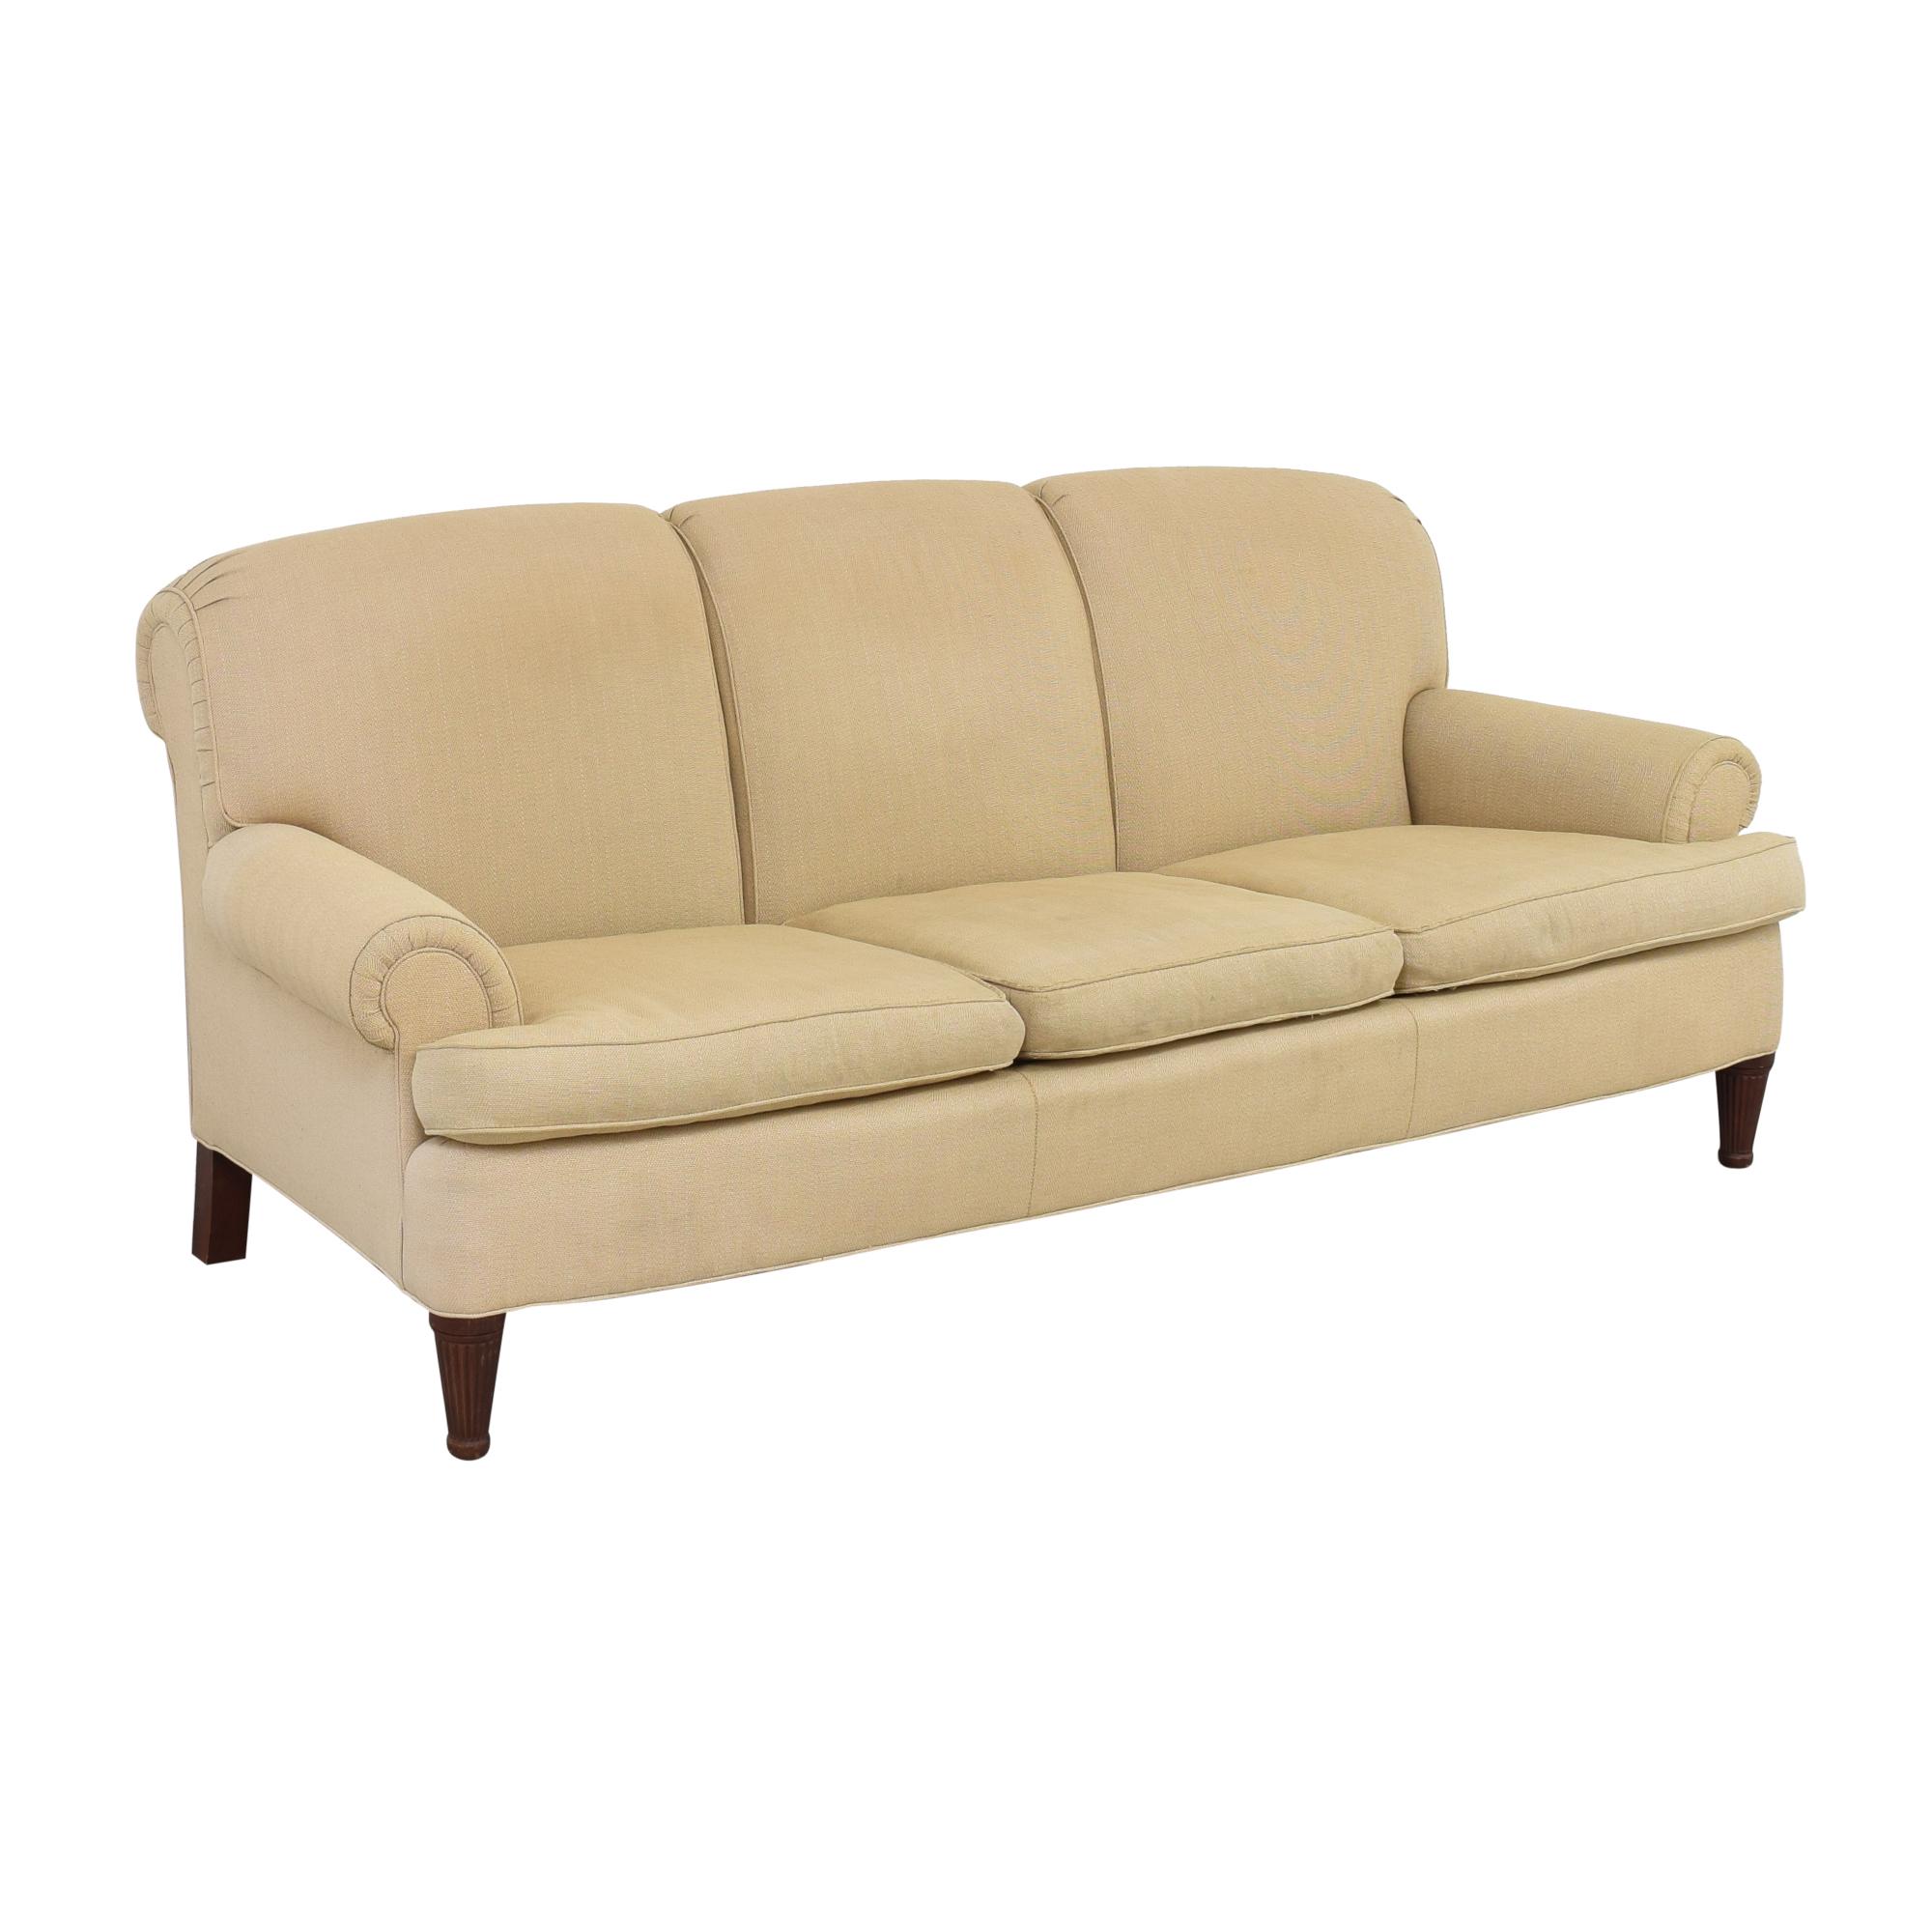 Ralph Lauren Home Ralph Lauren Upholstered Roll Arm Sofa coupon